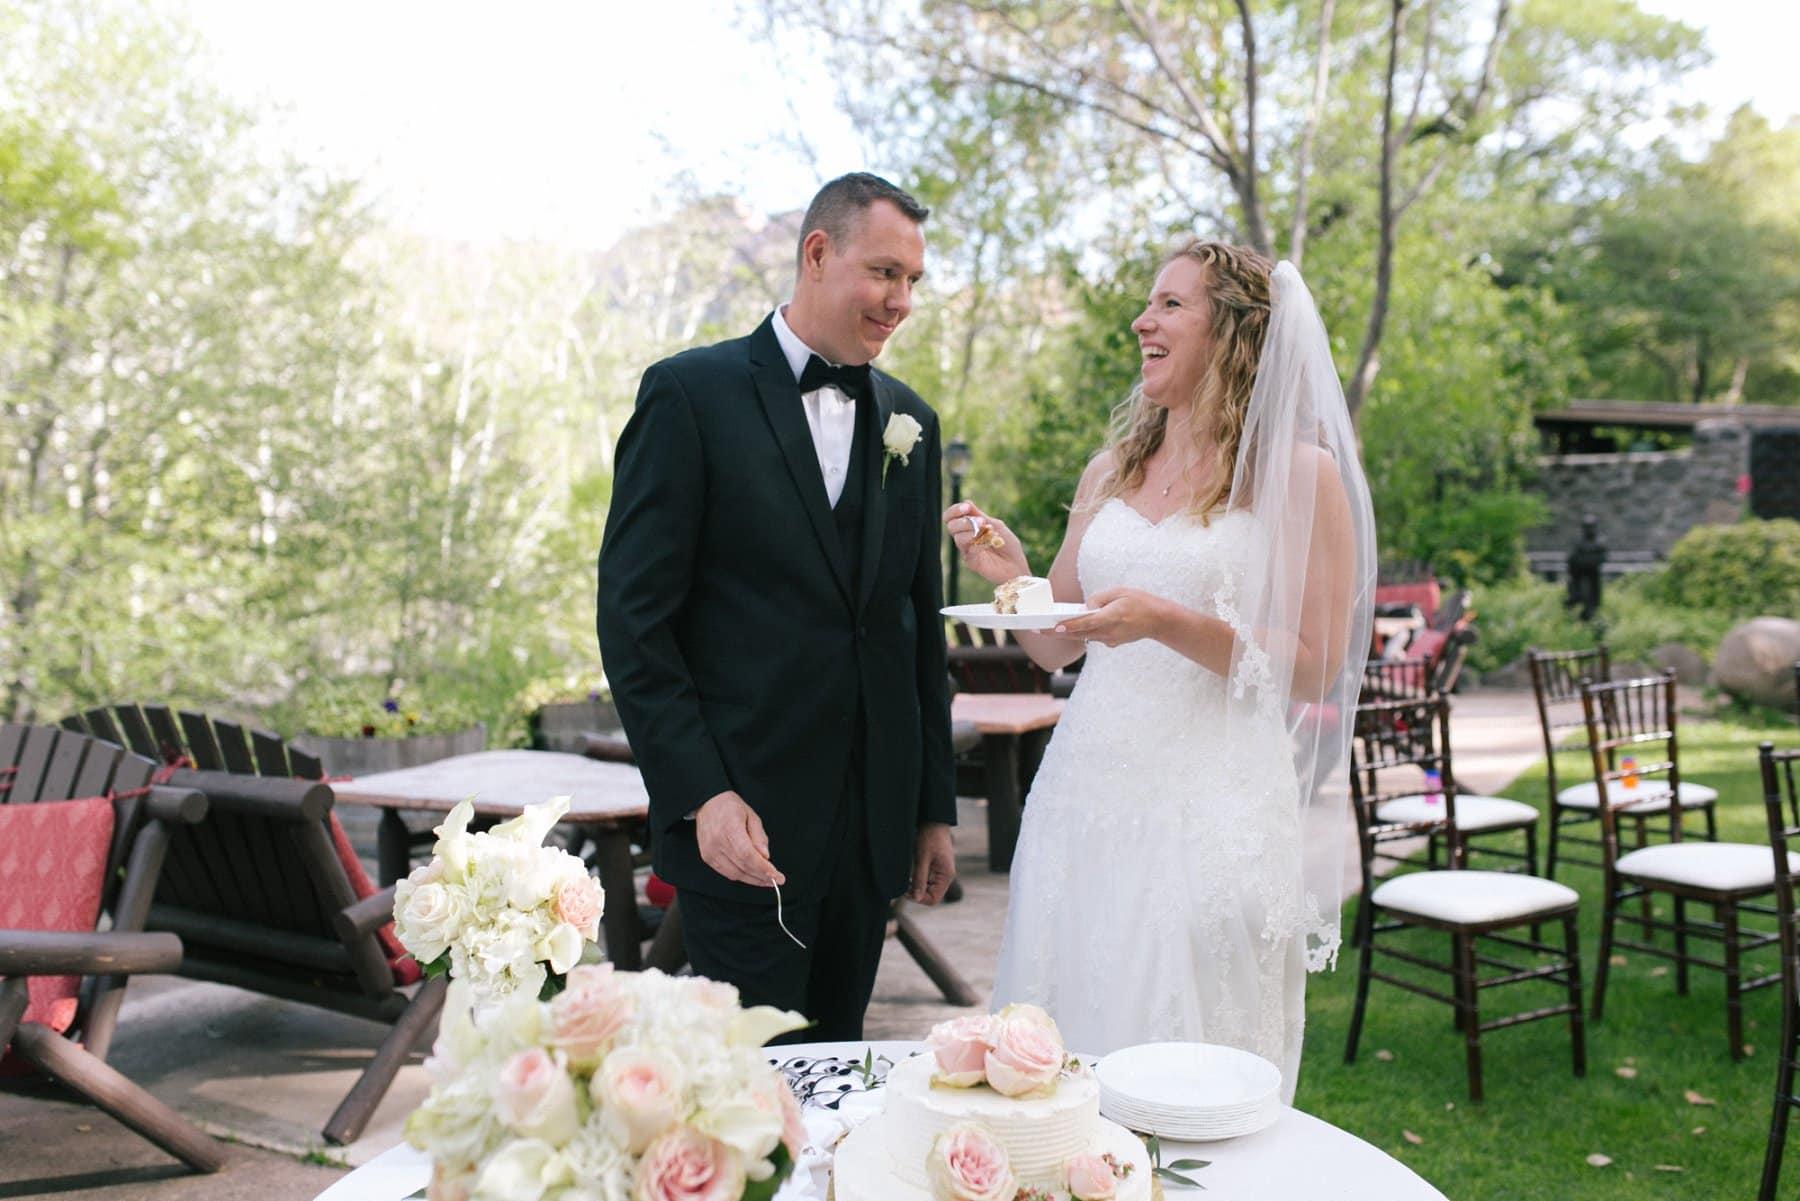 Briar Patch Inn bride & groom cake cutting Sedona